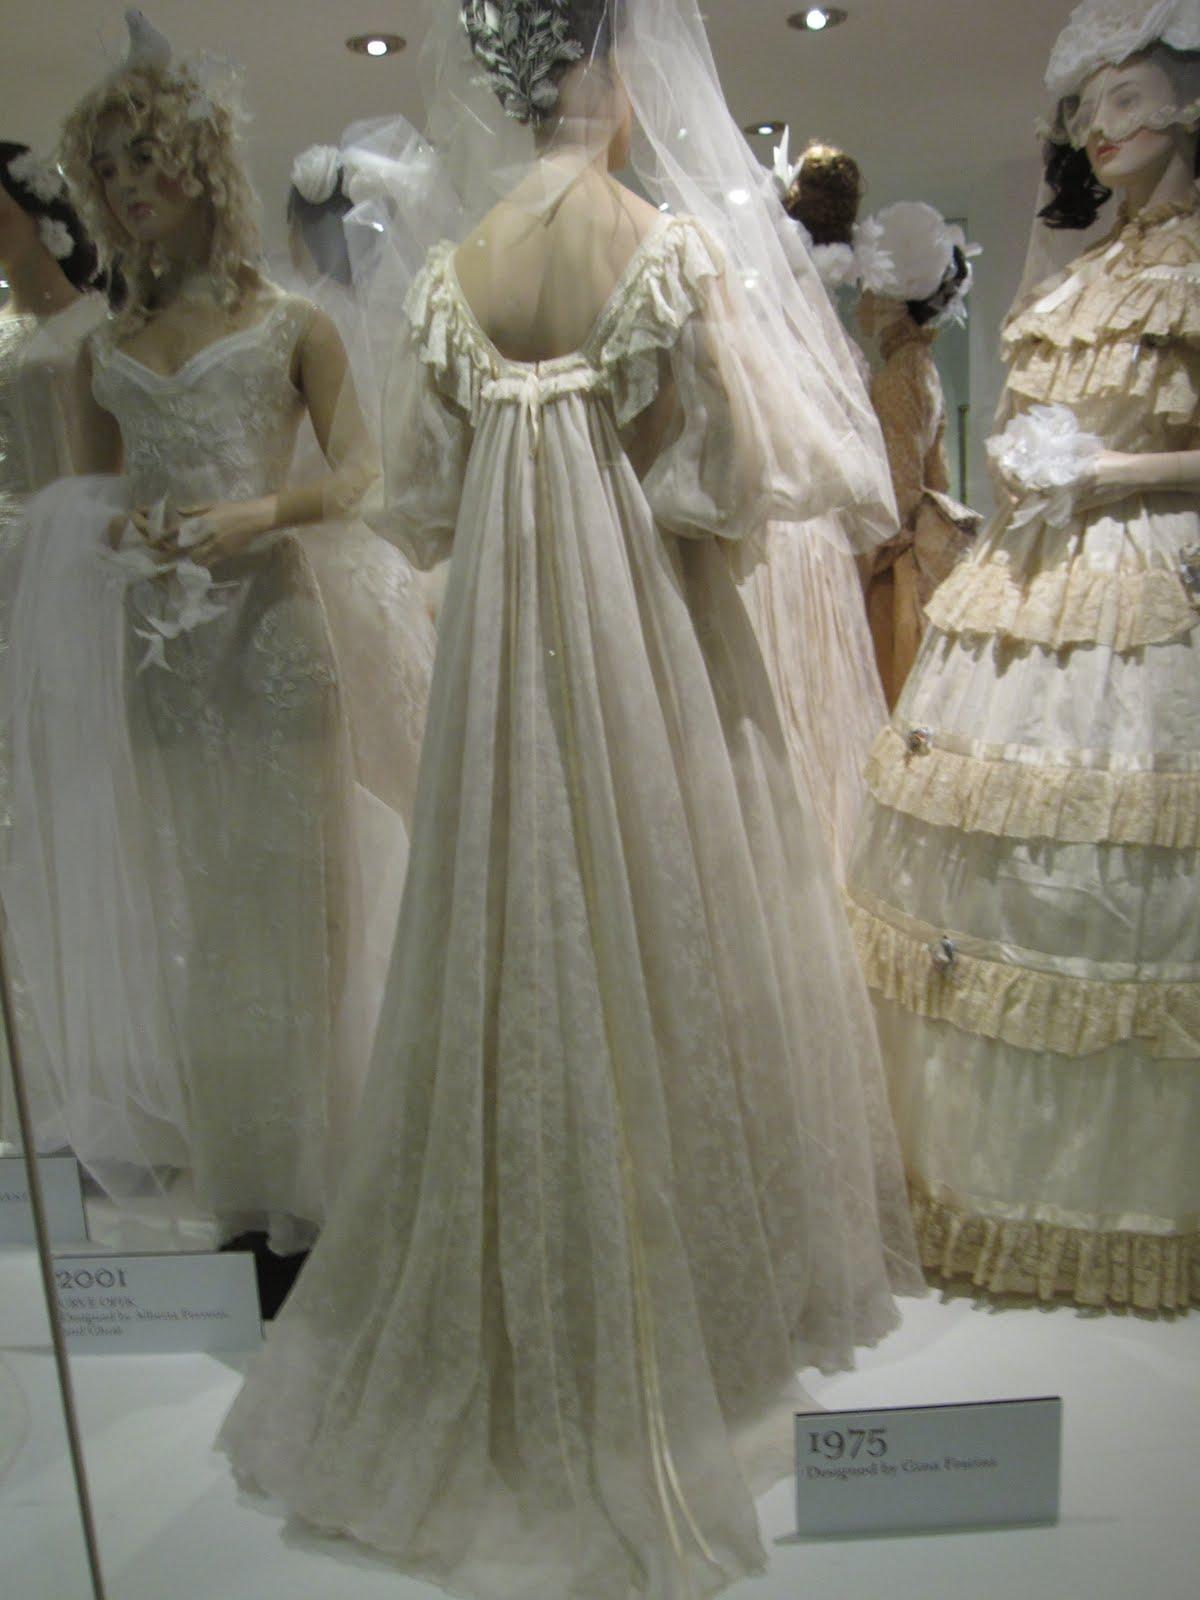 17th century wedding dresses photo gallery wedding for 17th century wedding dresses